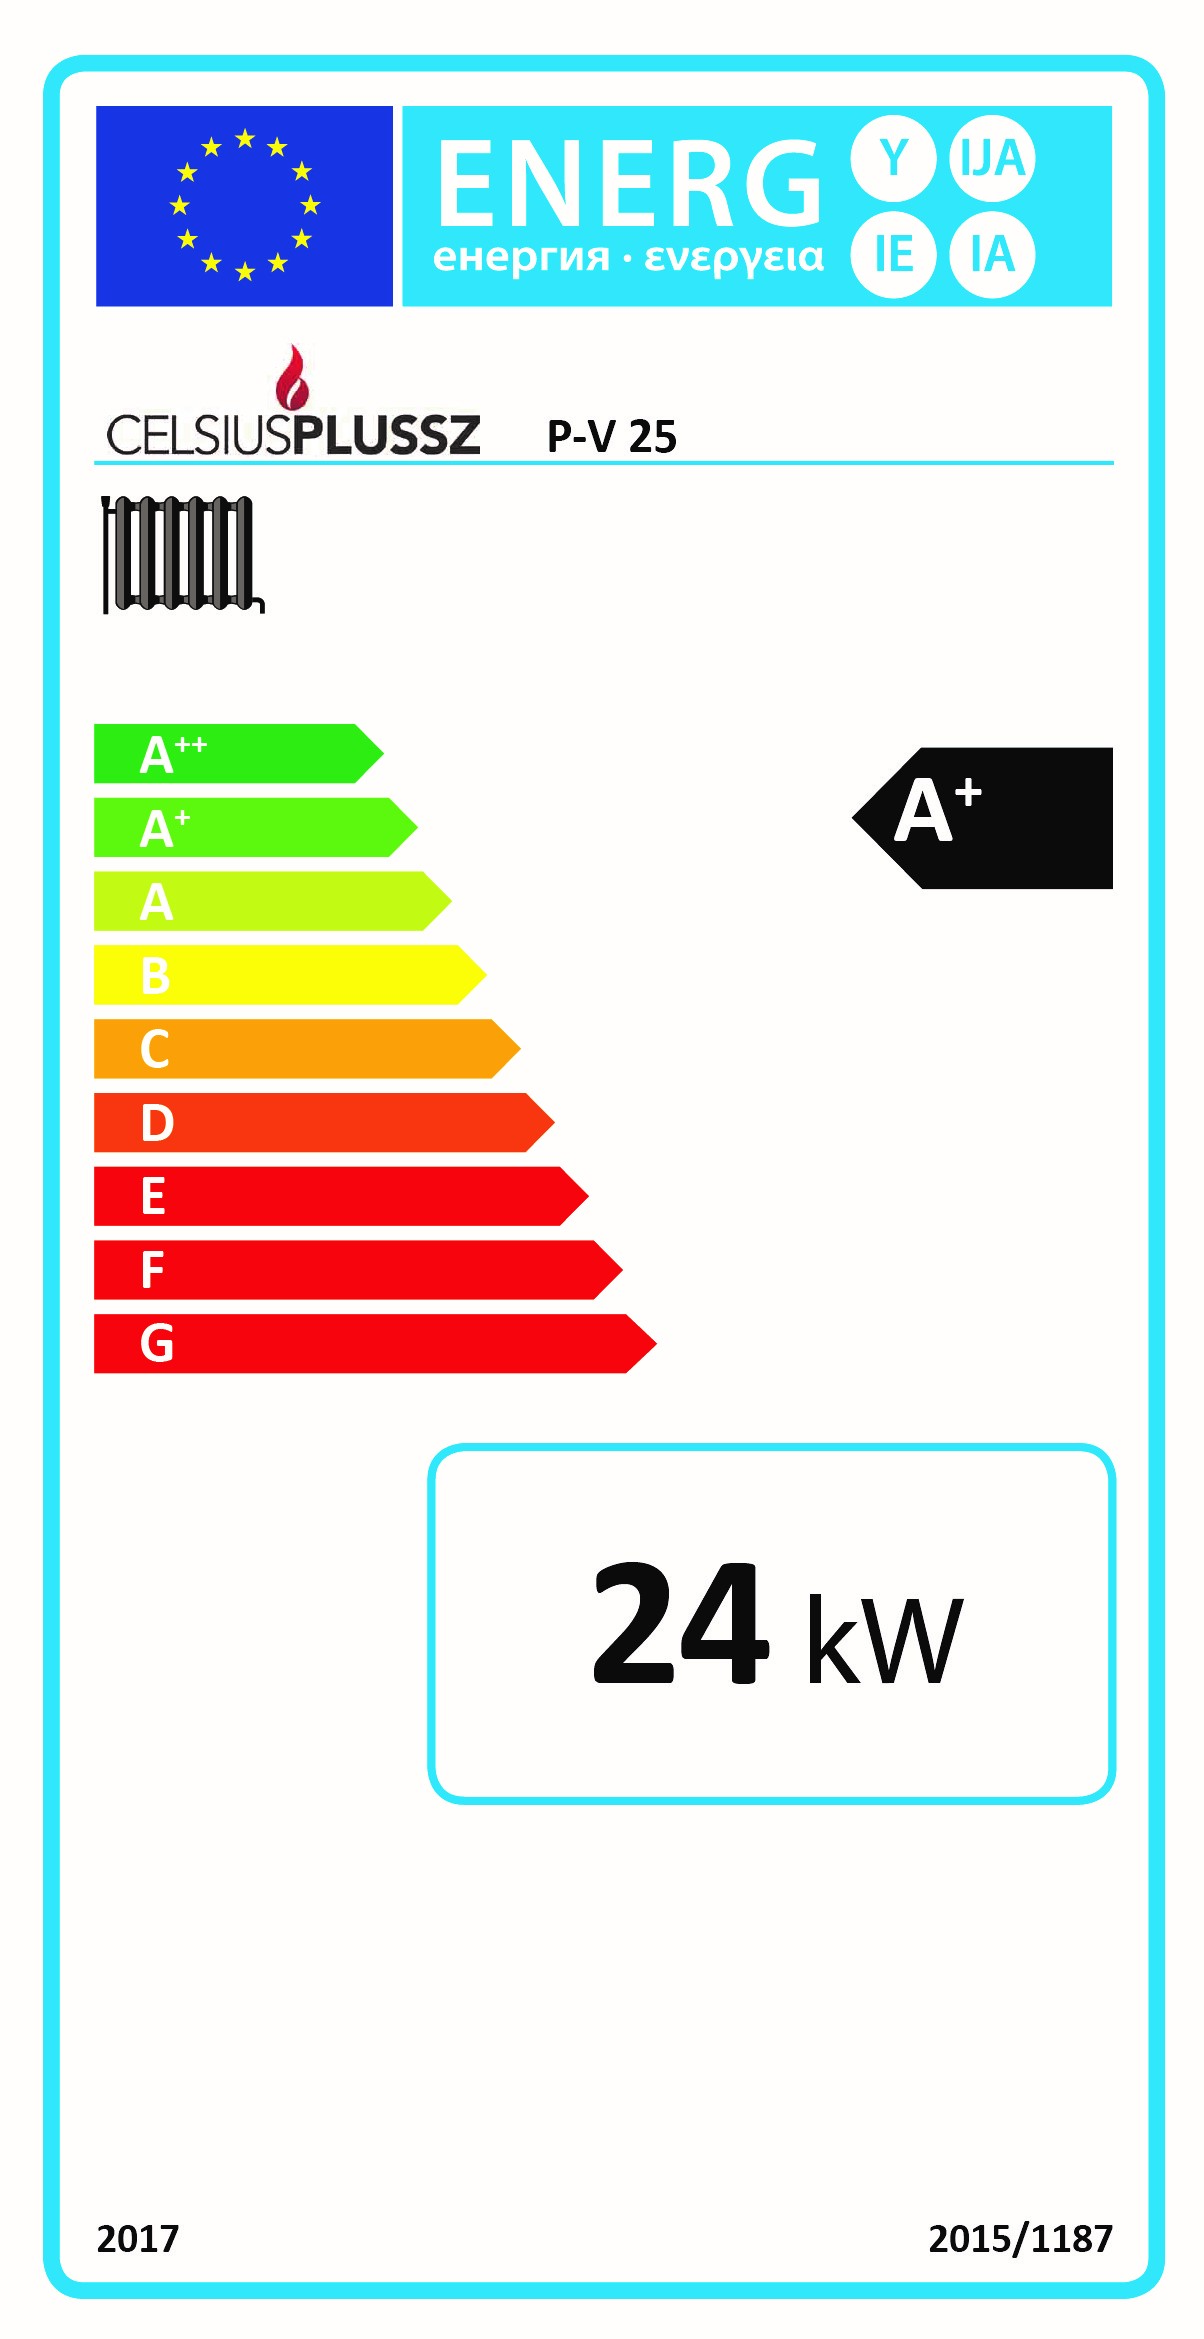 Celsius P-V 25 energy label